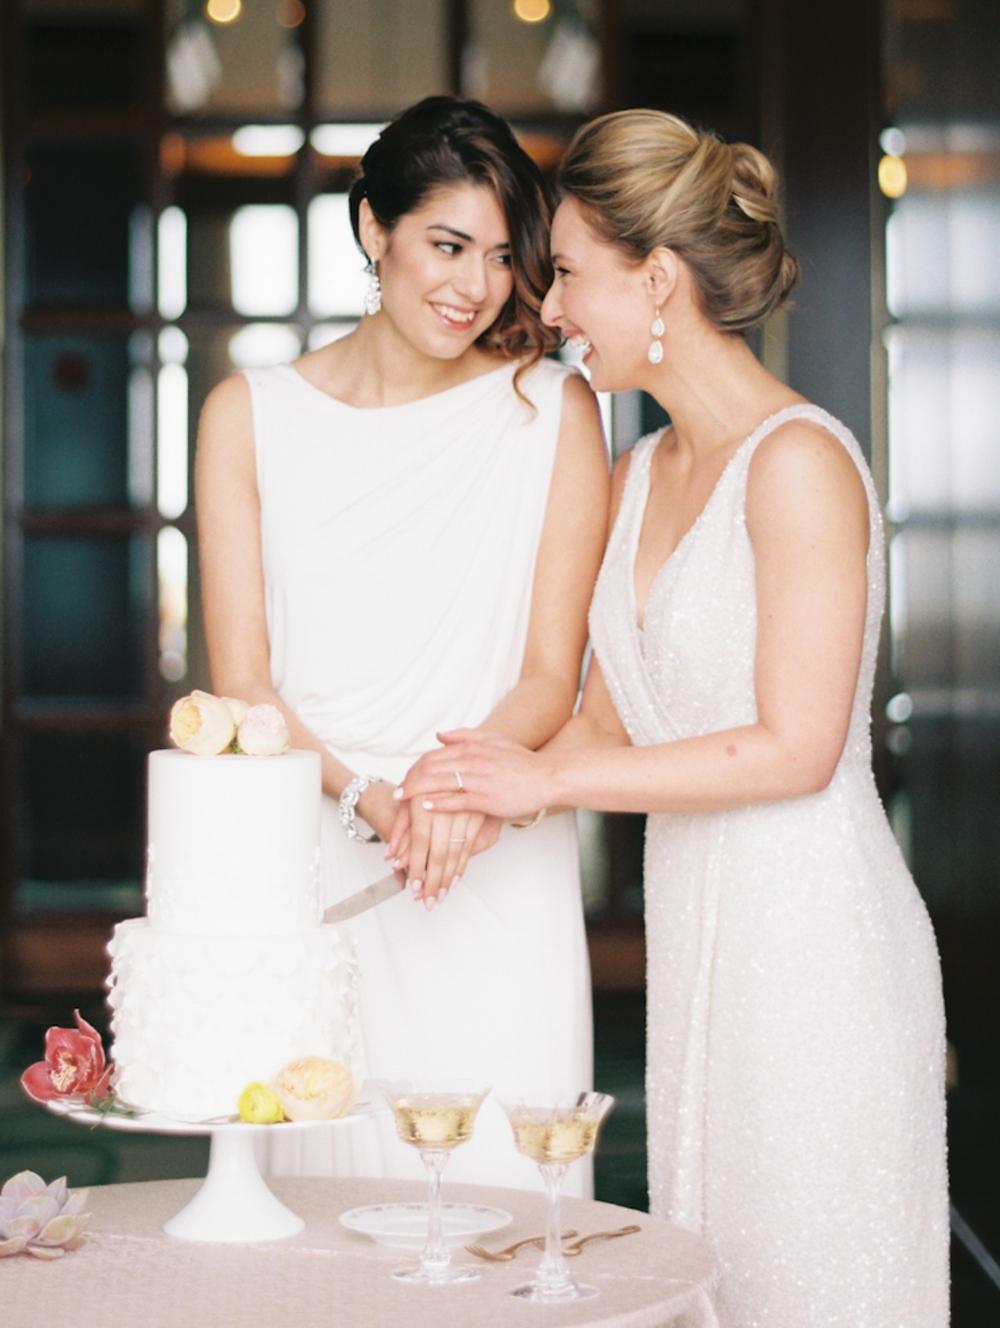 Same Sex cake cutting